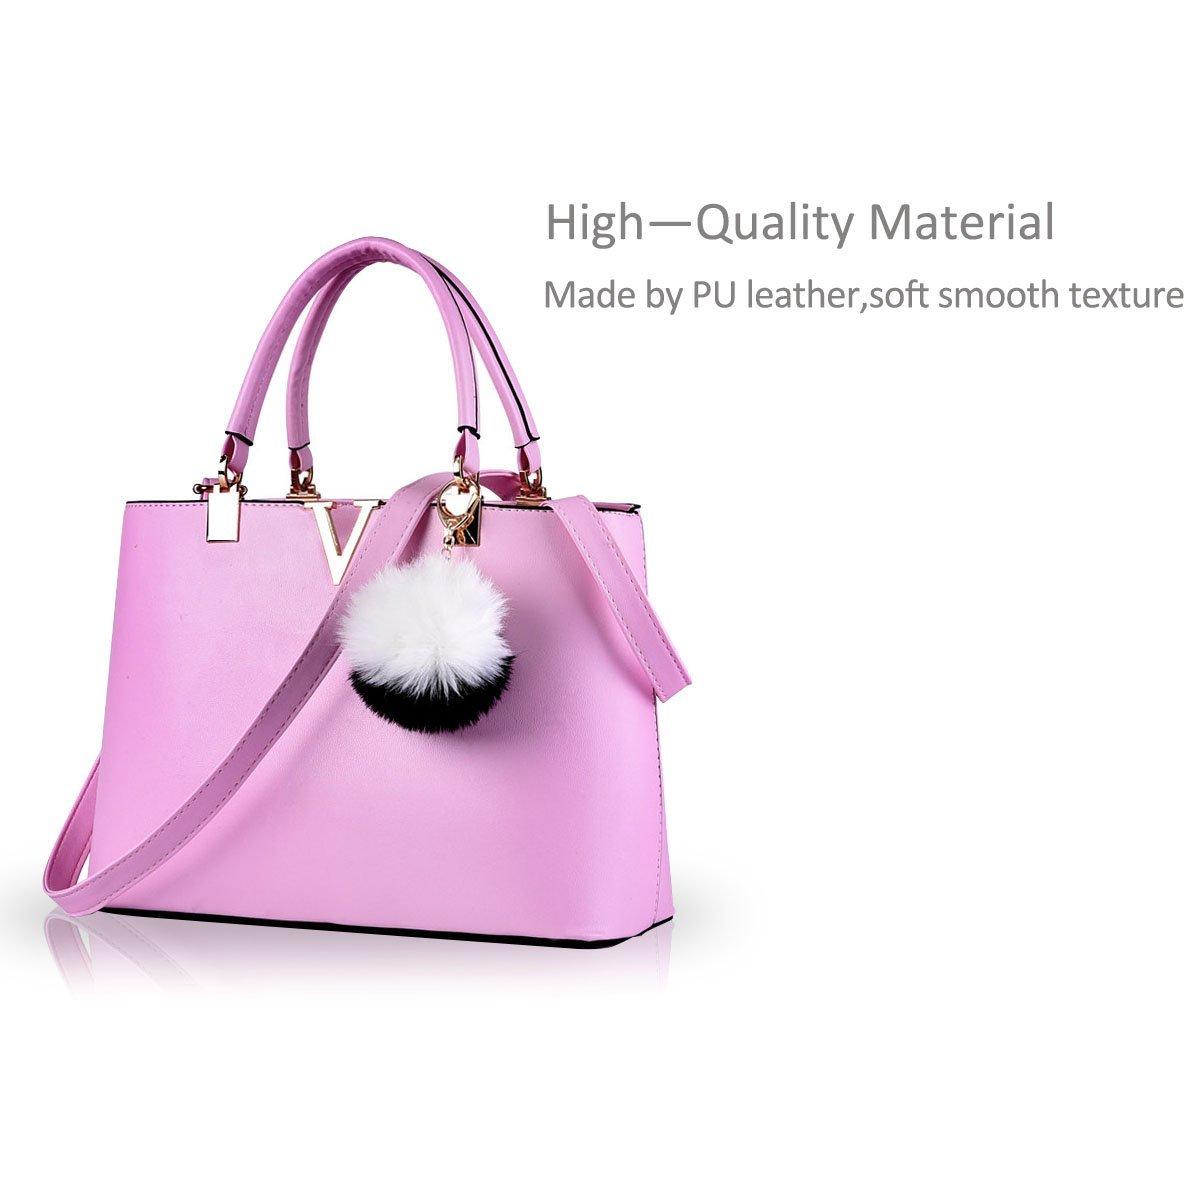 NICOLE & DORIS For Women's Casual Shoulder Cross Body Bags Spring 2017 Spring New Trends Minimal Fashion Handbags (Purple) by NICOLE & DORIS (Image #4)